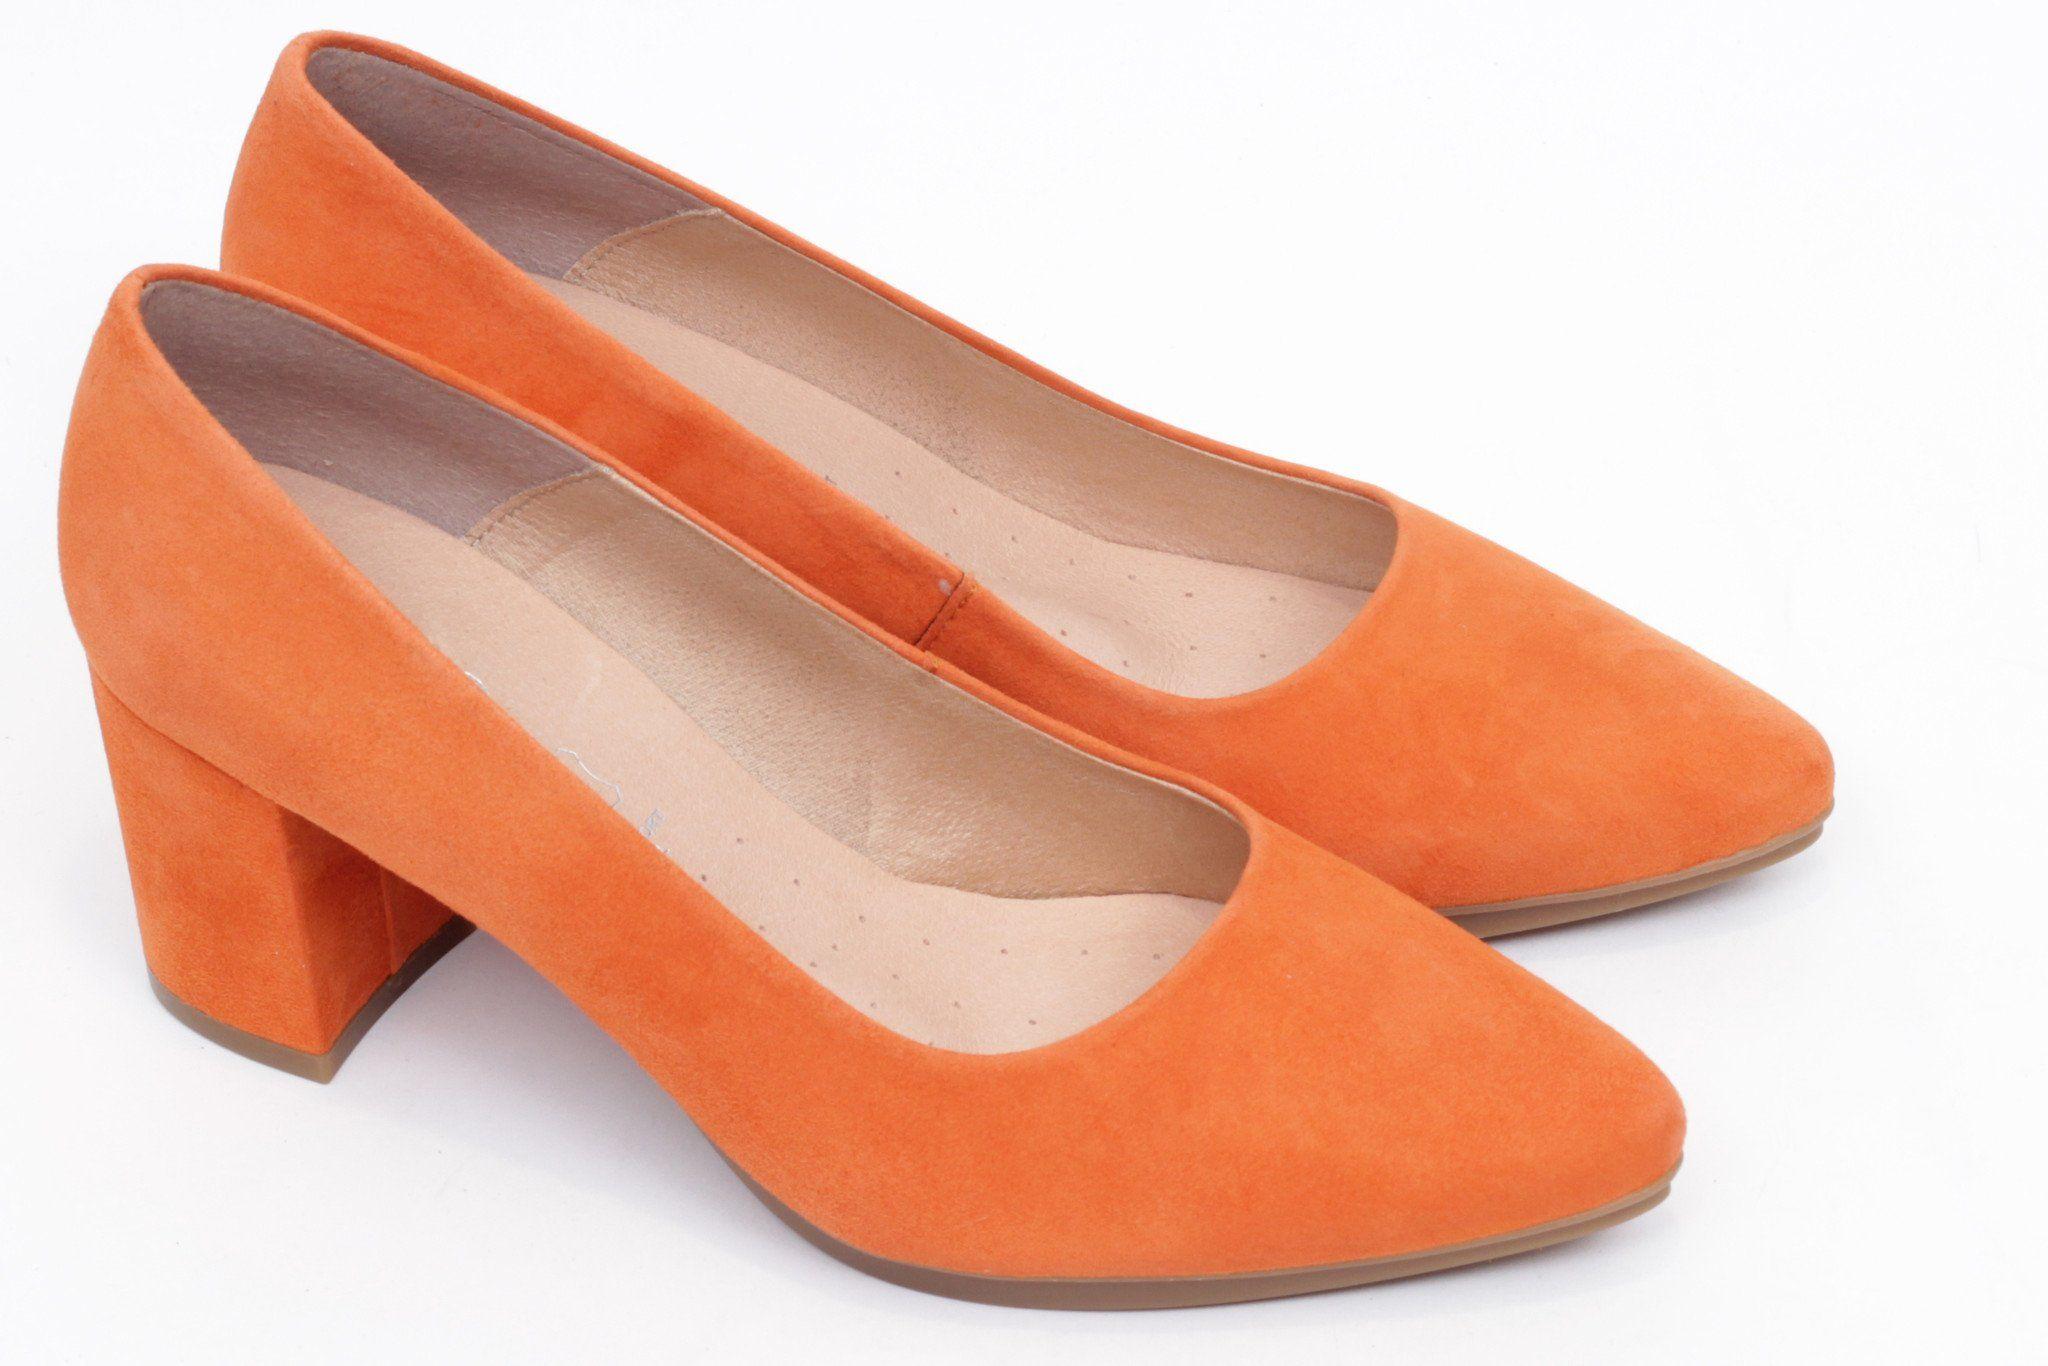 miMaO Urban S naranja - Zapato mujer de tacon salon vestir rojo cómodo -  women high heels shoes red orange comfort pumps 586b2b2034f9